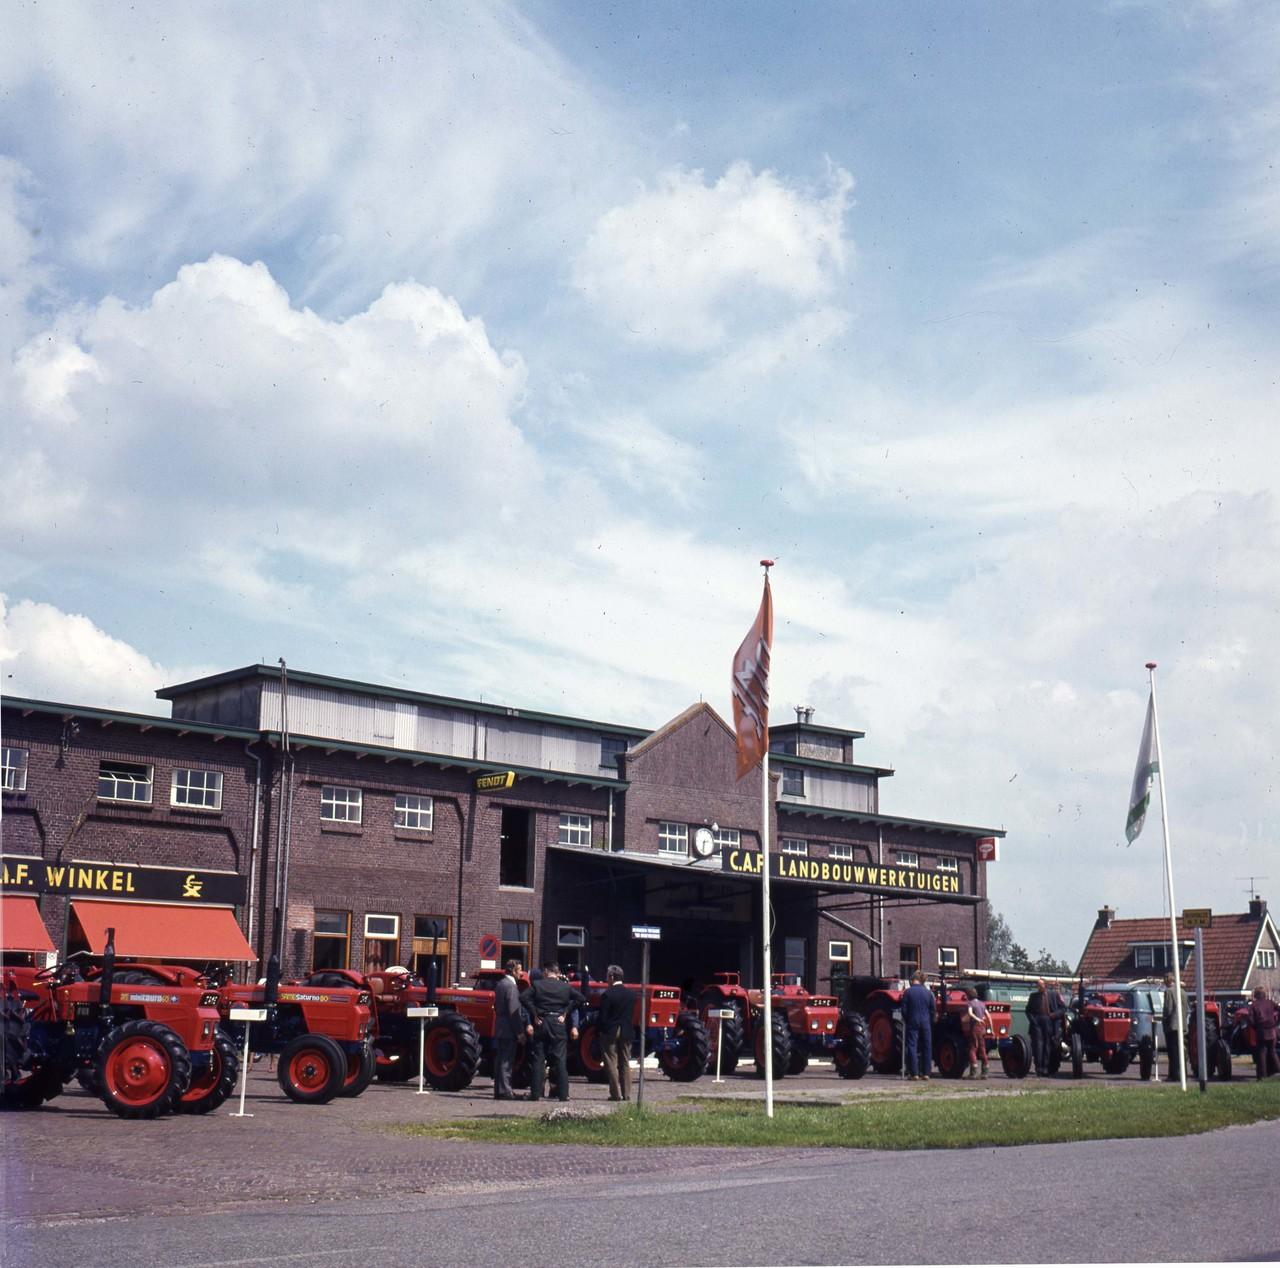 [SAME] trattori SAME in Olanda (lett. Cebeco 14/7/1972)